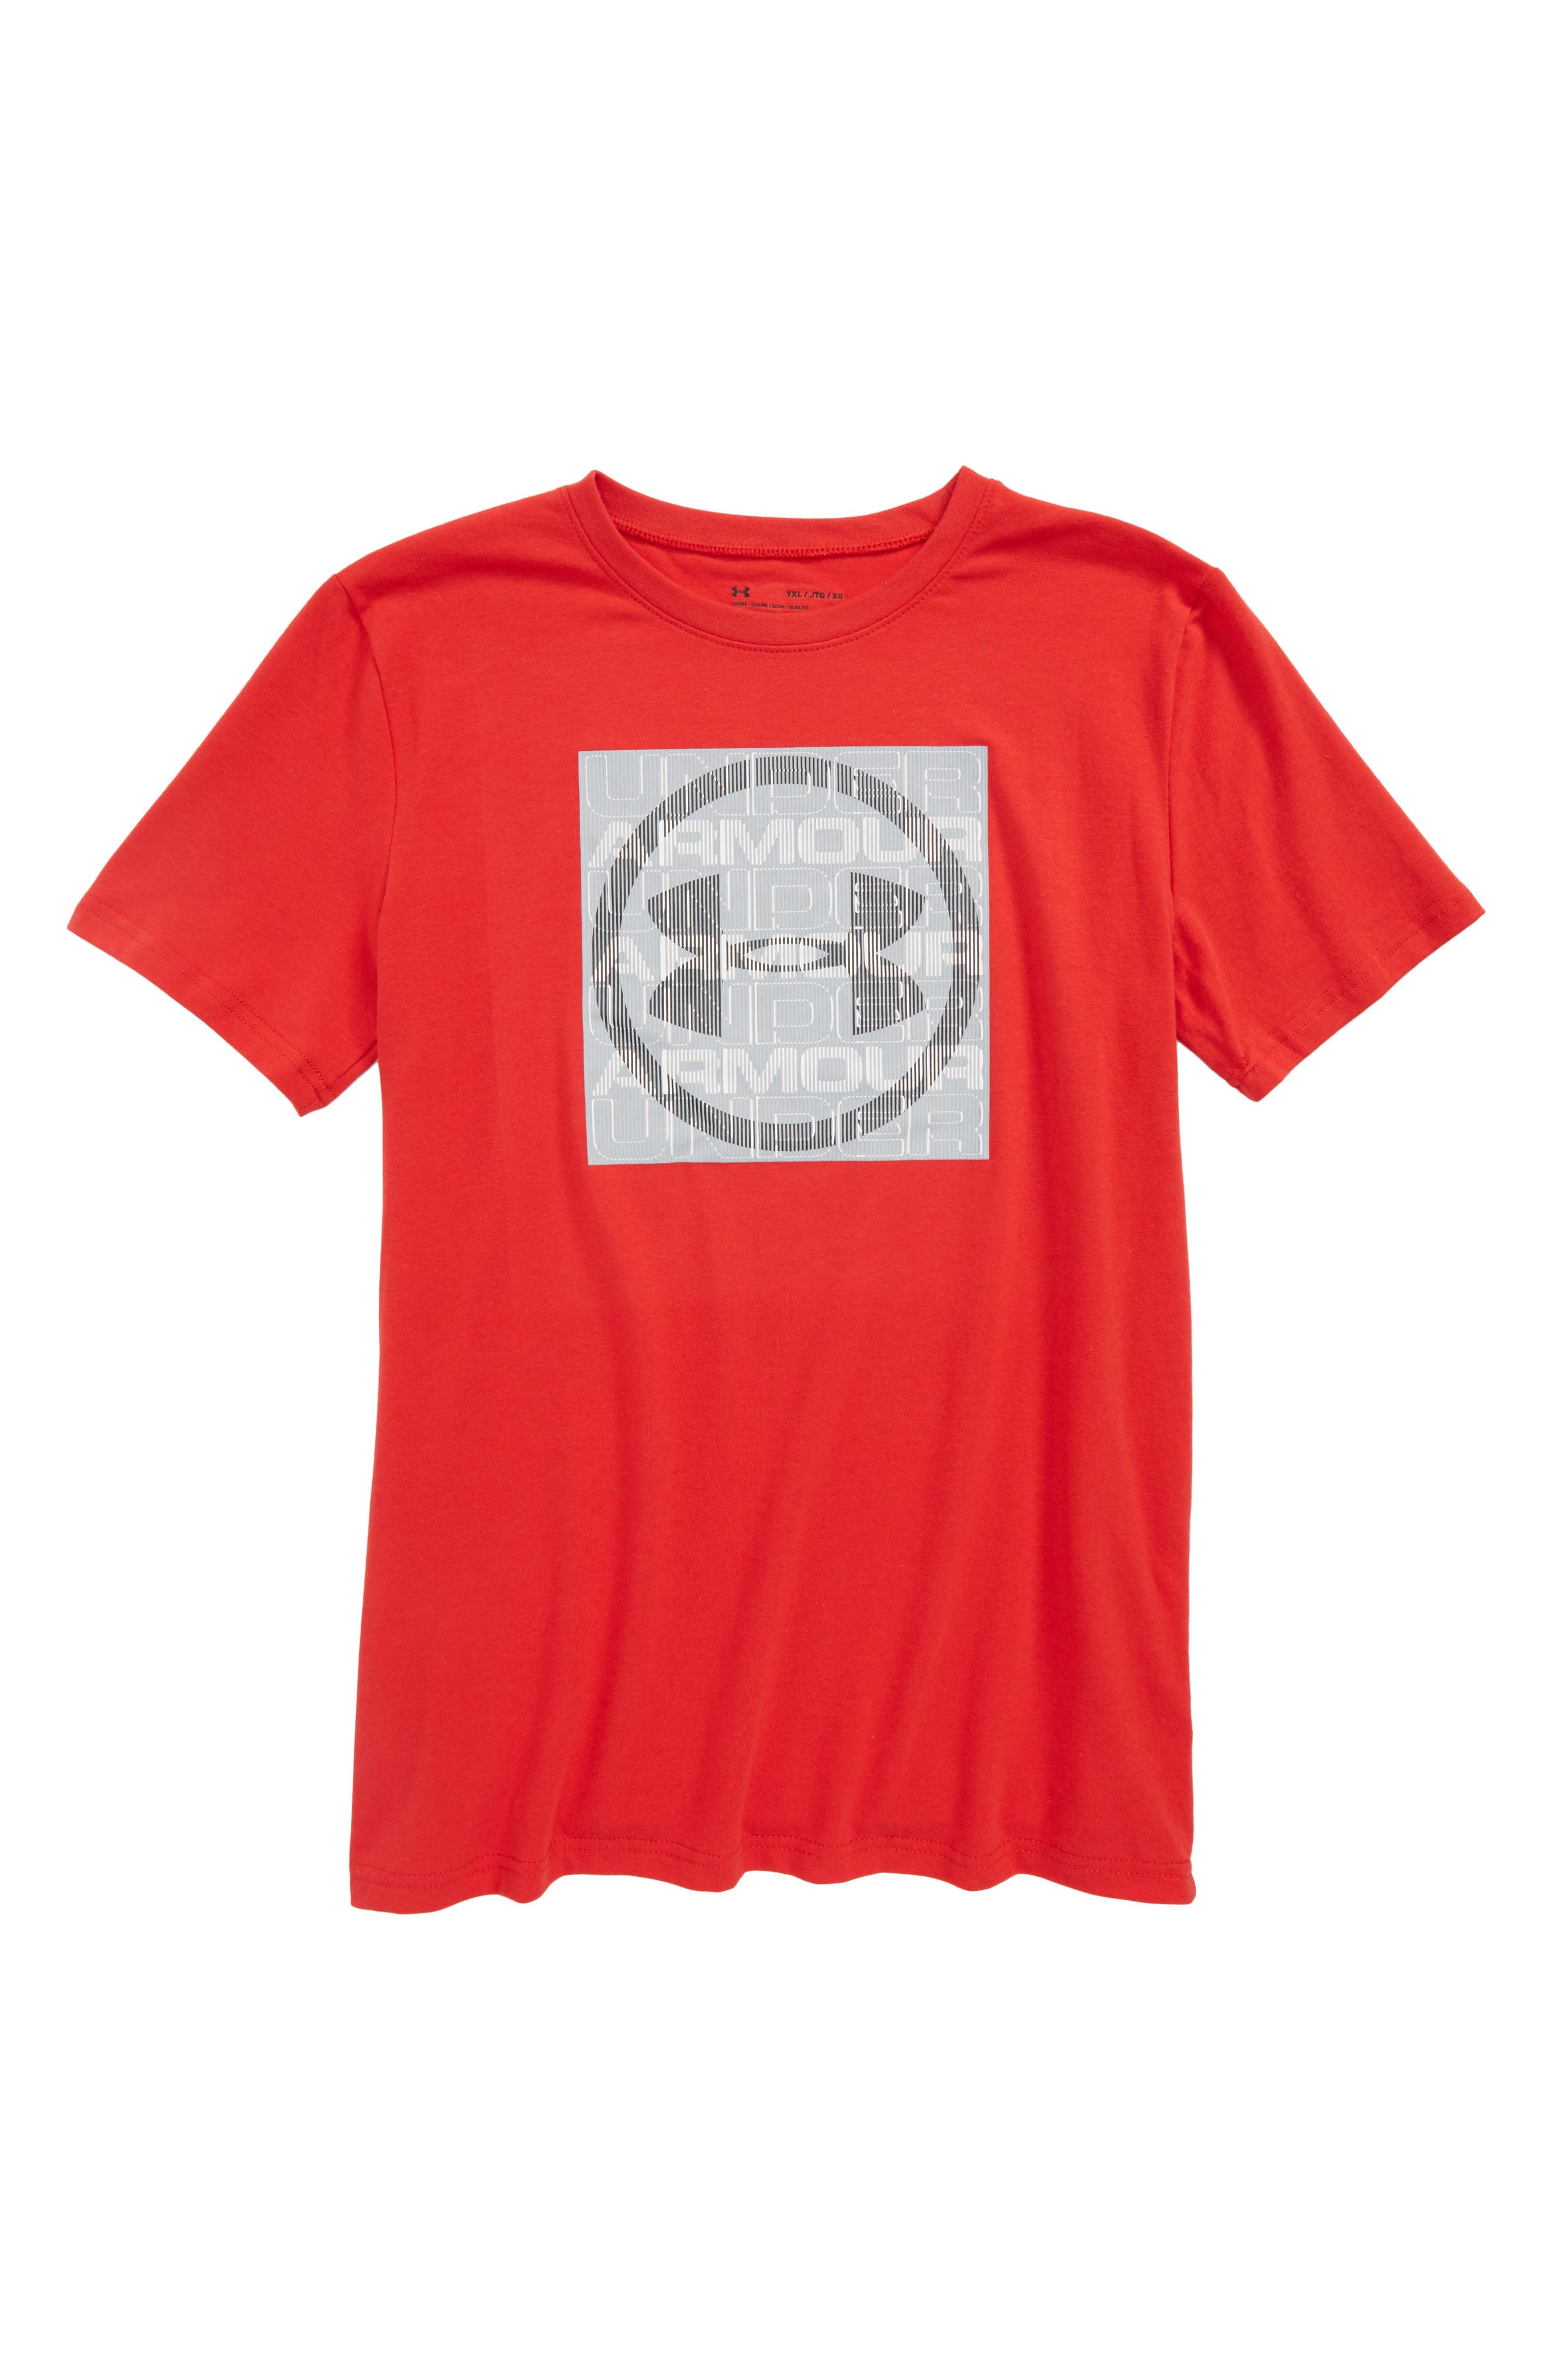 Visualogo T-Shirt,                             Main thumbnail 1, color,                             Red/ Black